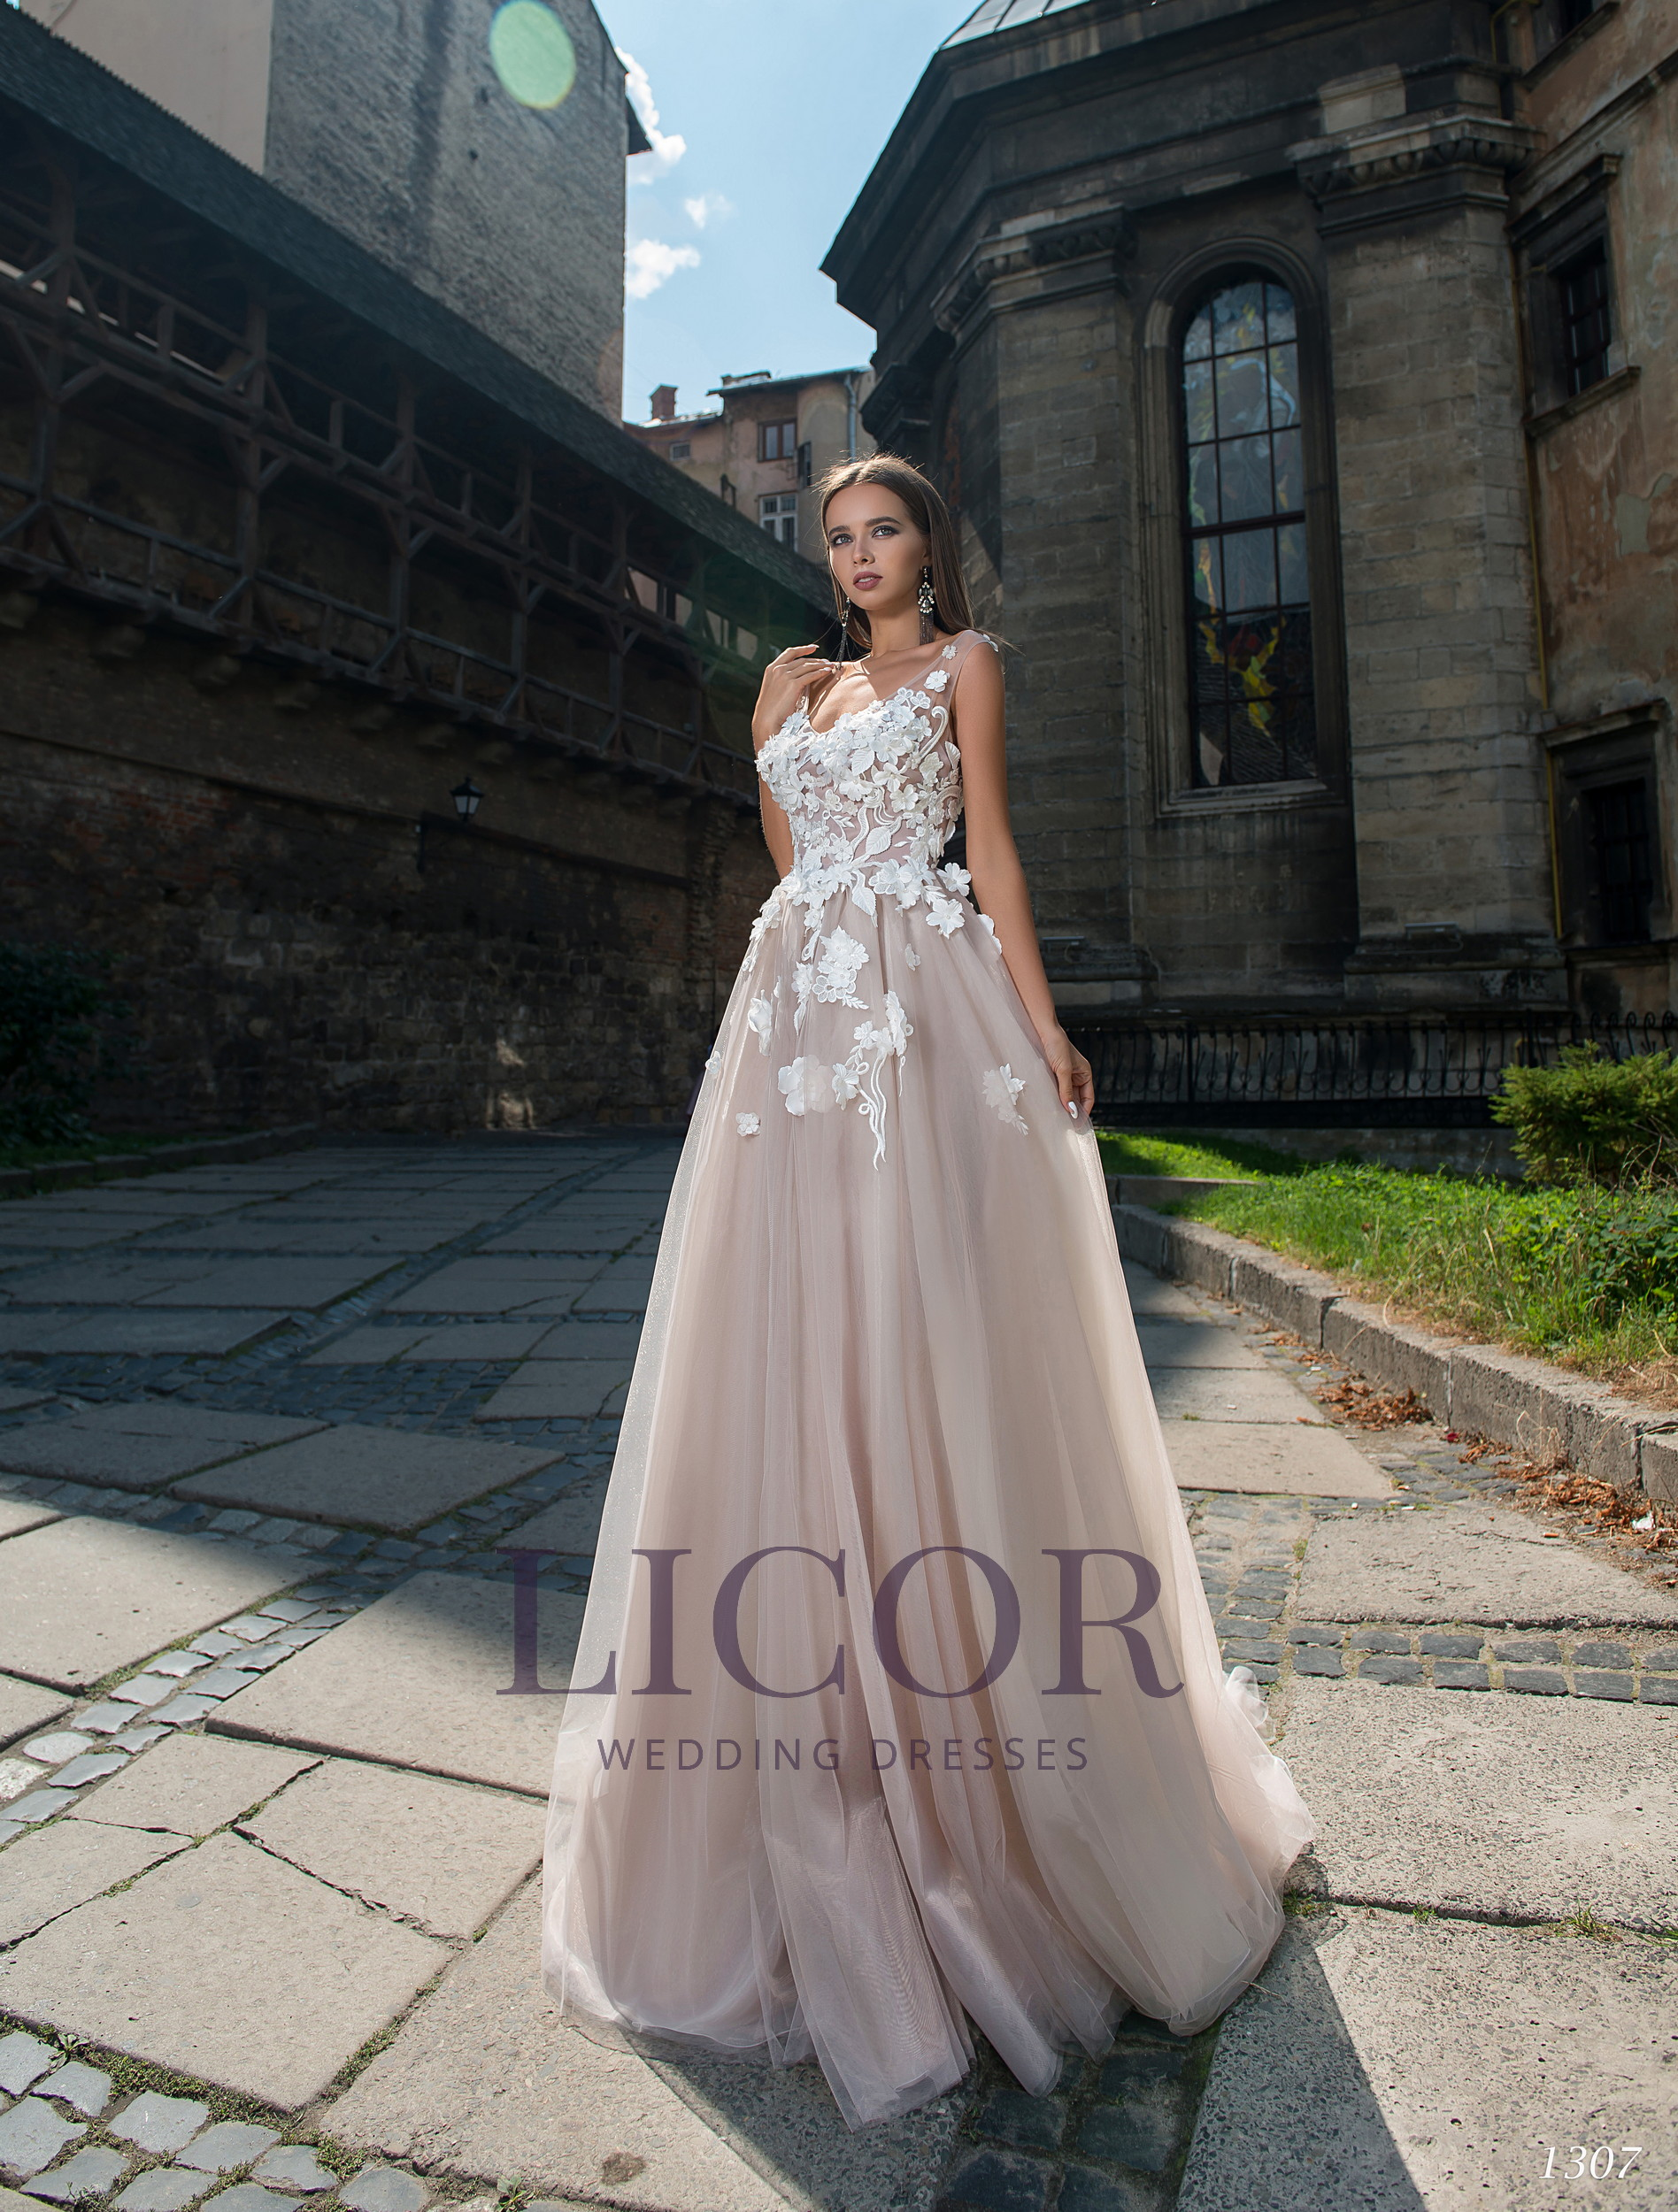 http://licor.com.ua/images/stories/virtuemart/product/1307(1).jpg